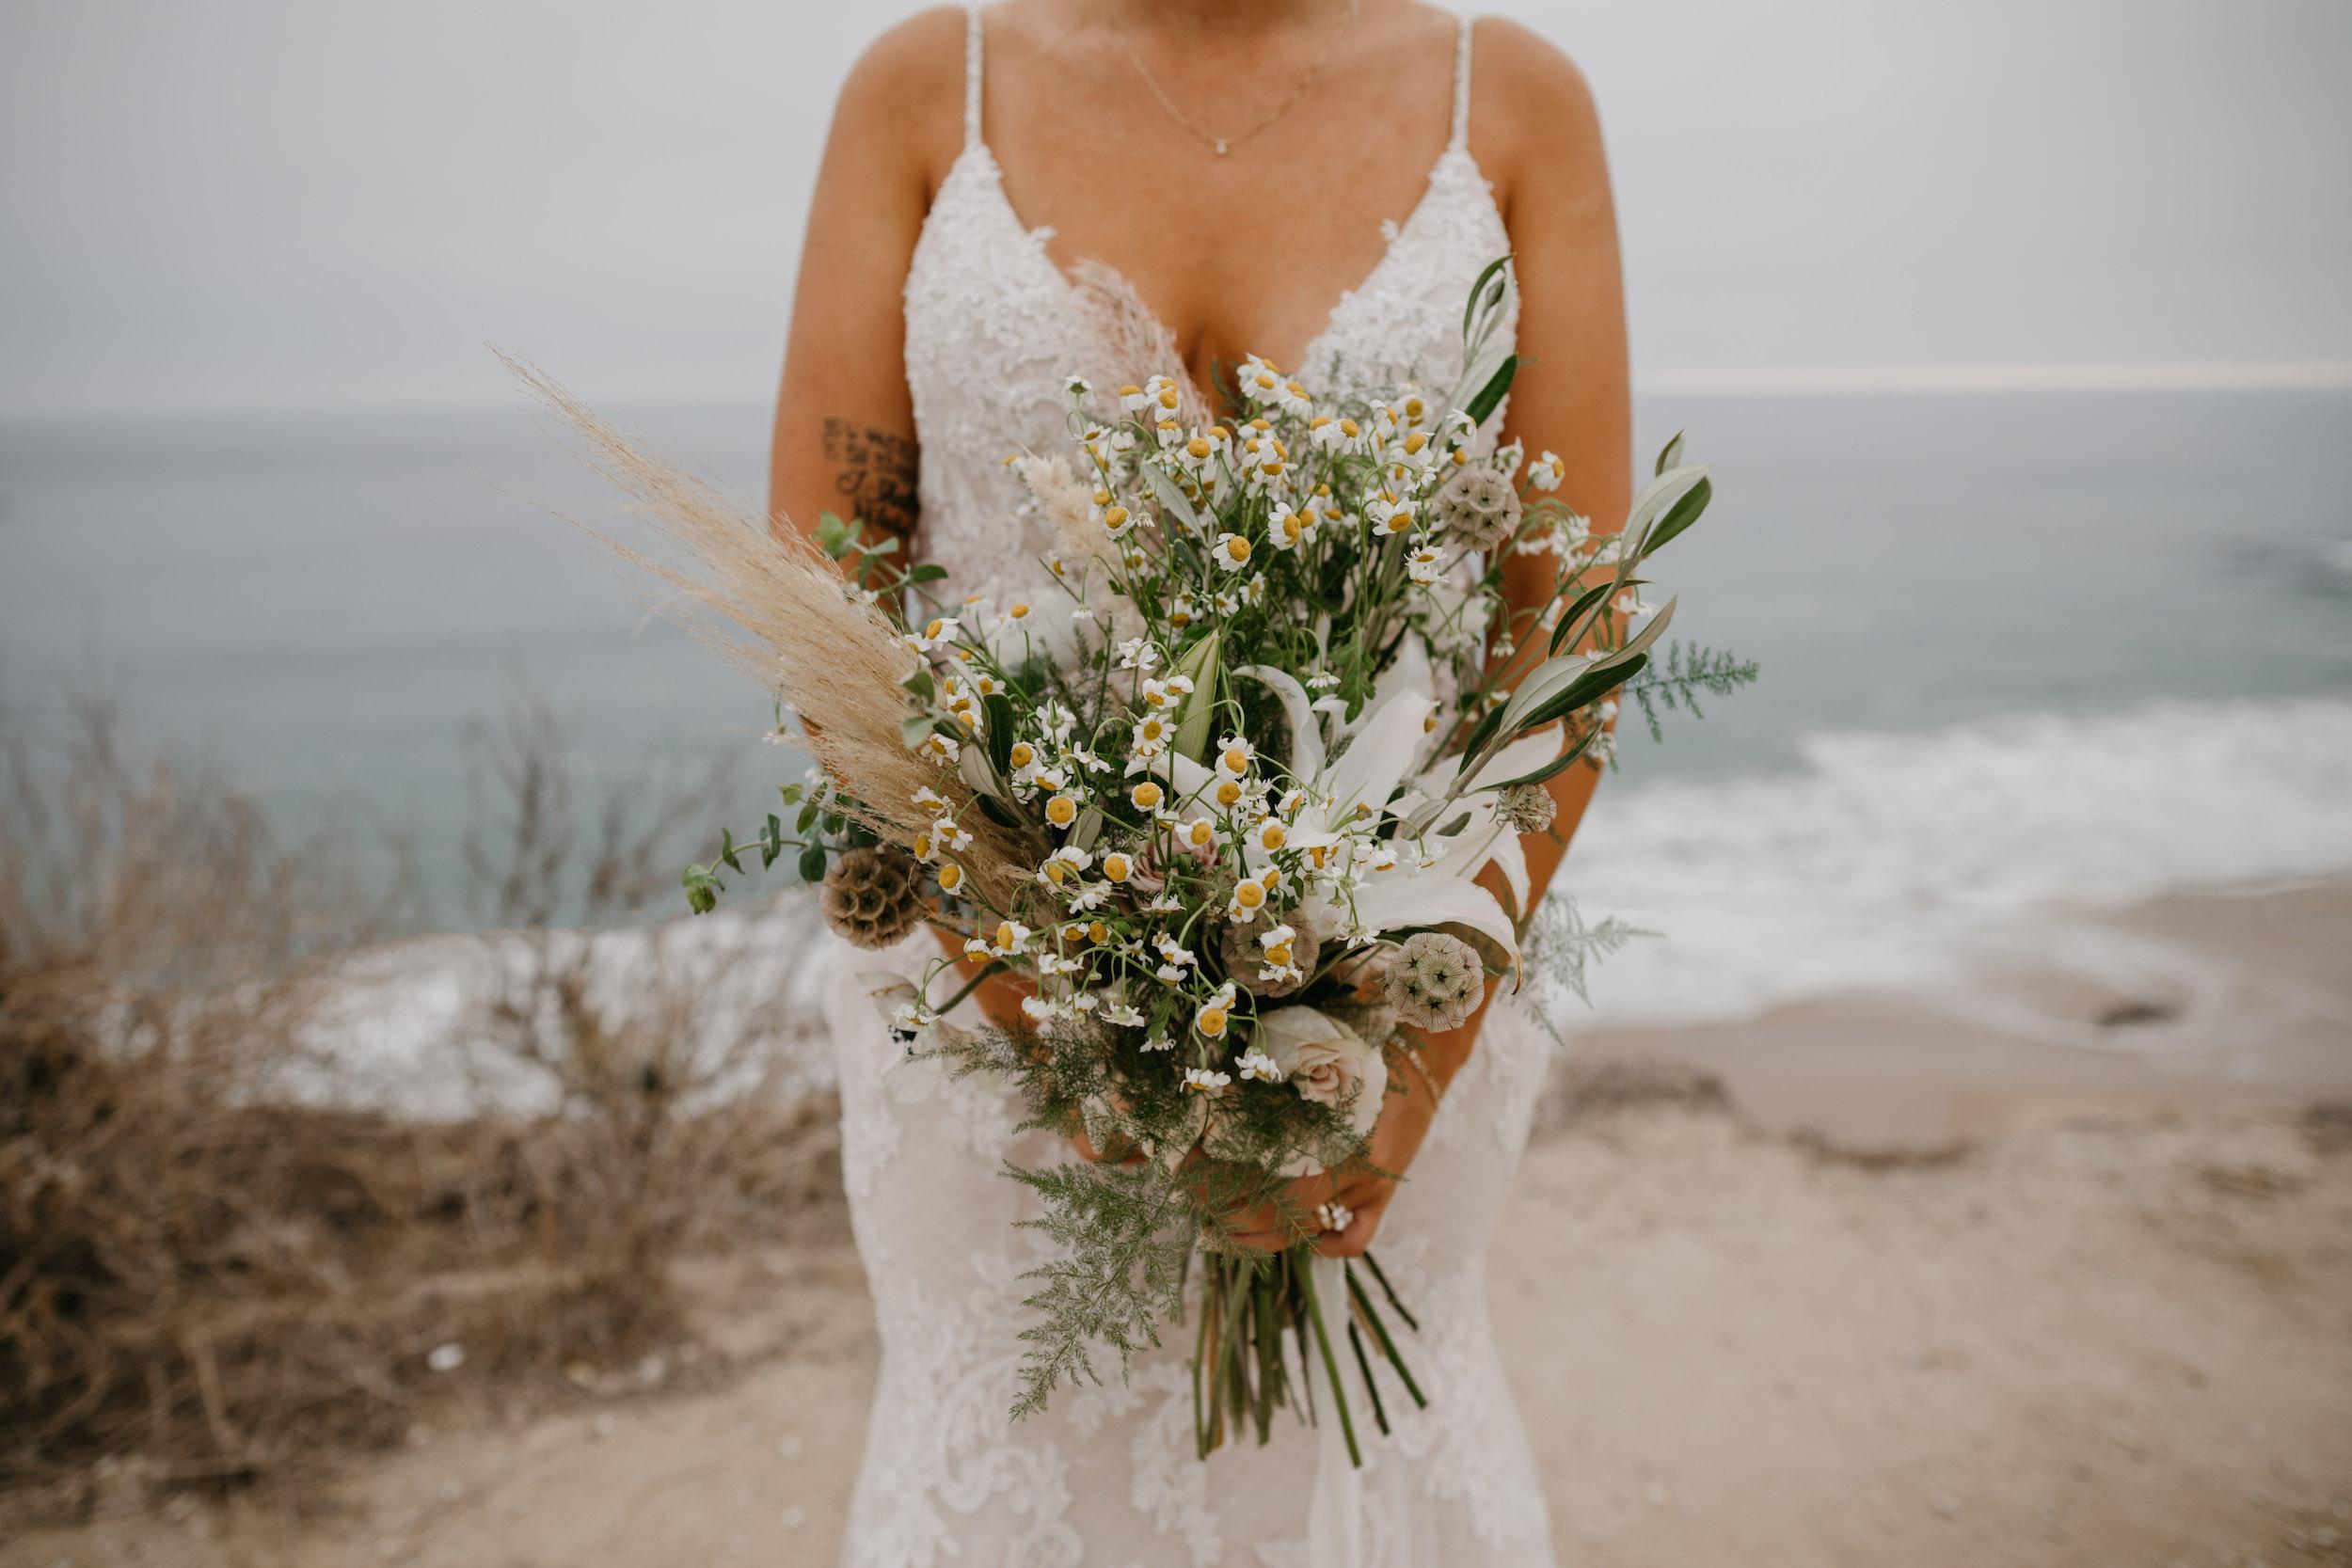 Wedding Bouquet for Beach Wedding in Crystal Cove State Park Wedding in Laguna Beach, image by Fatima Elreda Photo